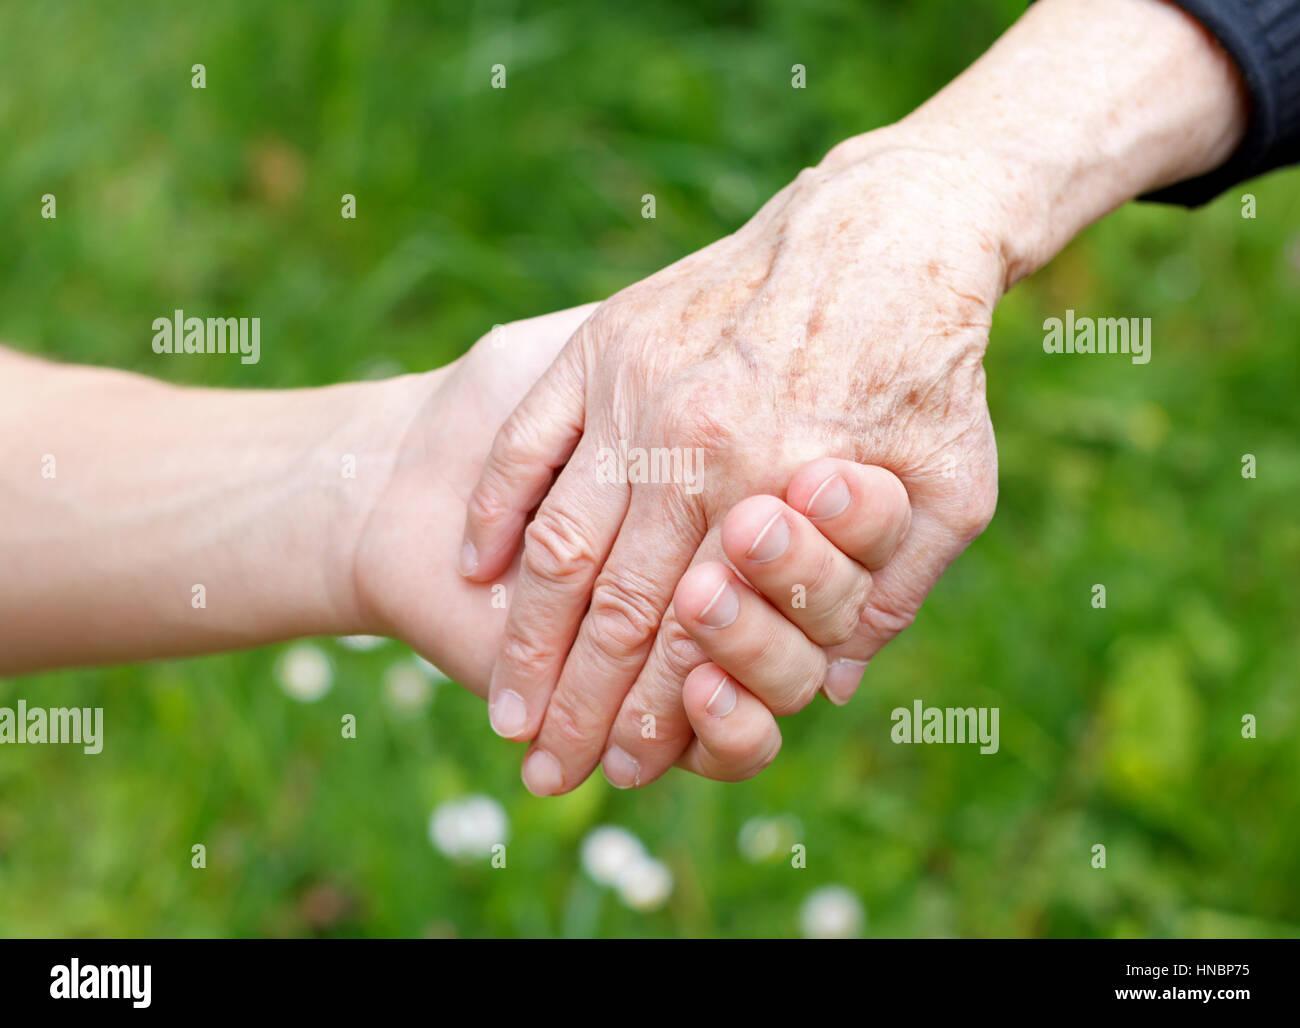 Doctor's hand holding a wrinkled elderly hand - Stock Image